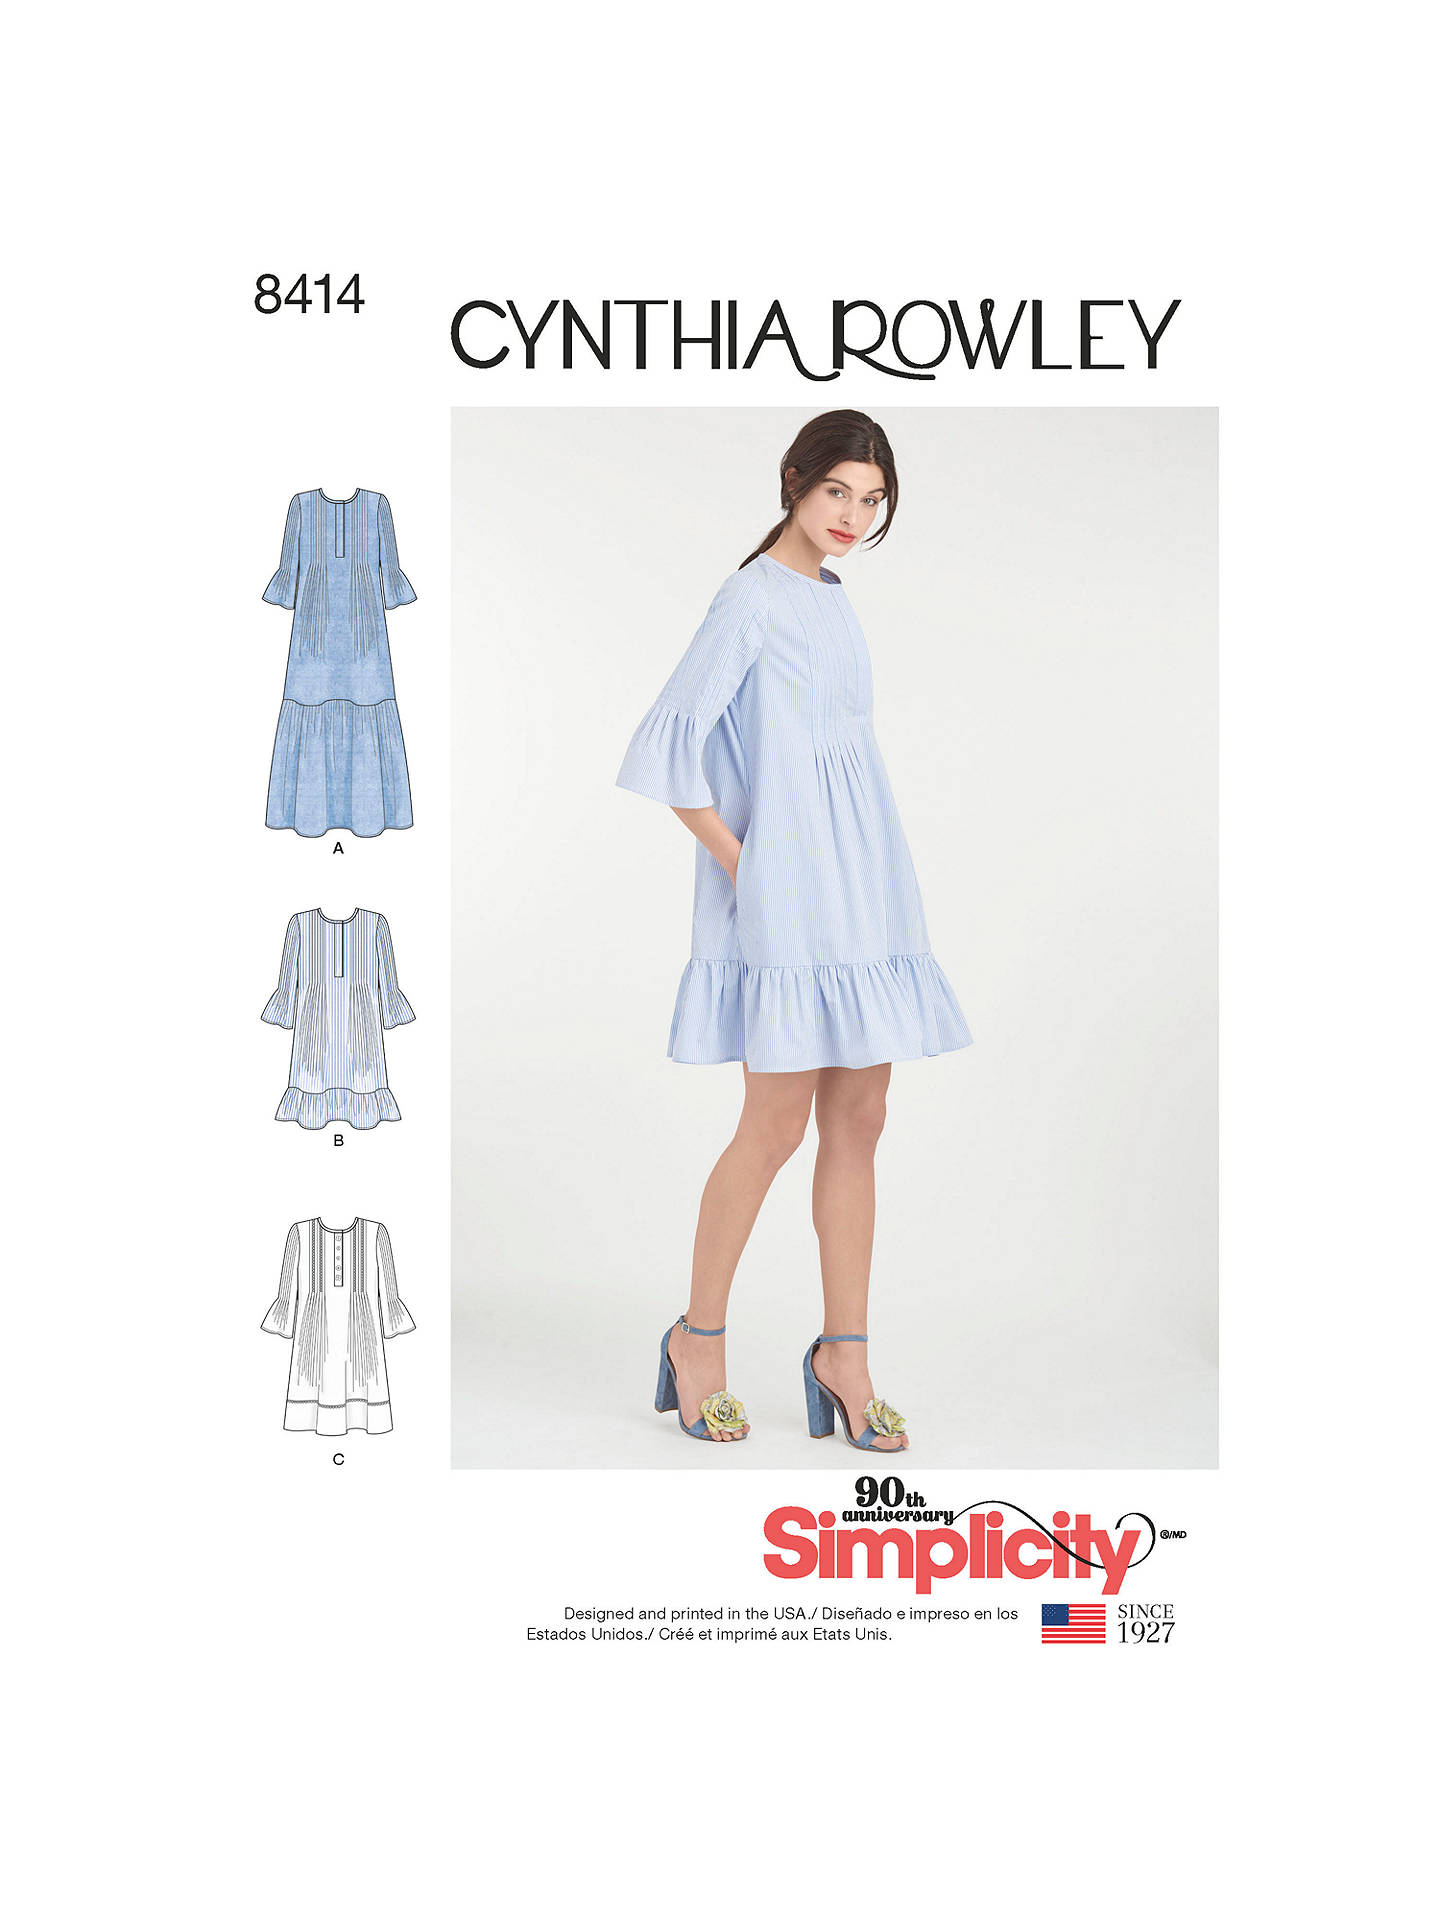 3d34c86ac0 Buy Simplicity Cynthia Rowley Pintuck Ruffle Dress Sewing Pattern, 8414  Online at johnlewis.com ...